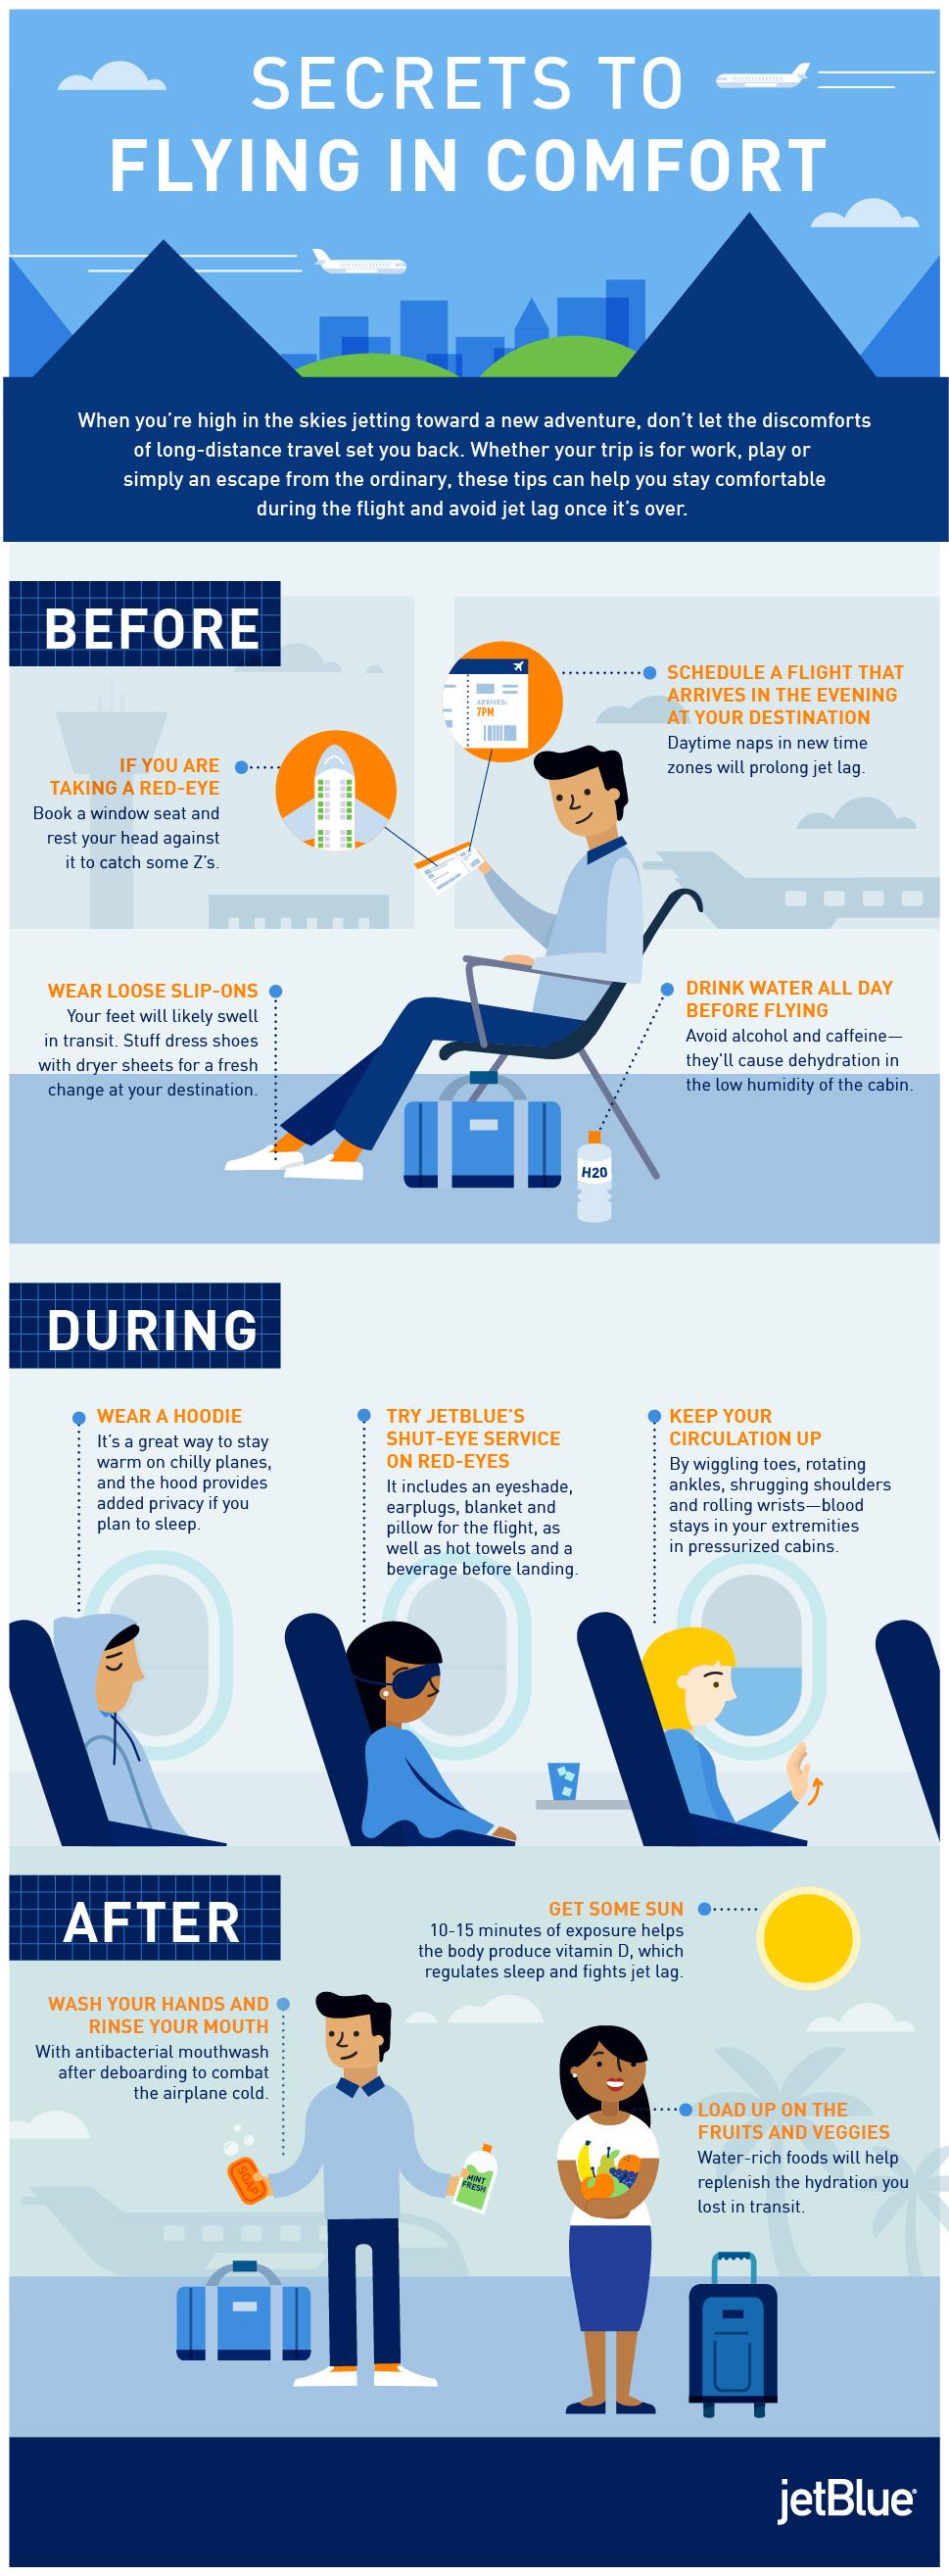 jetBlue - Secrets to Flying in Comfort